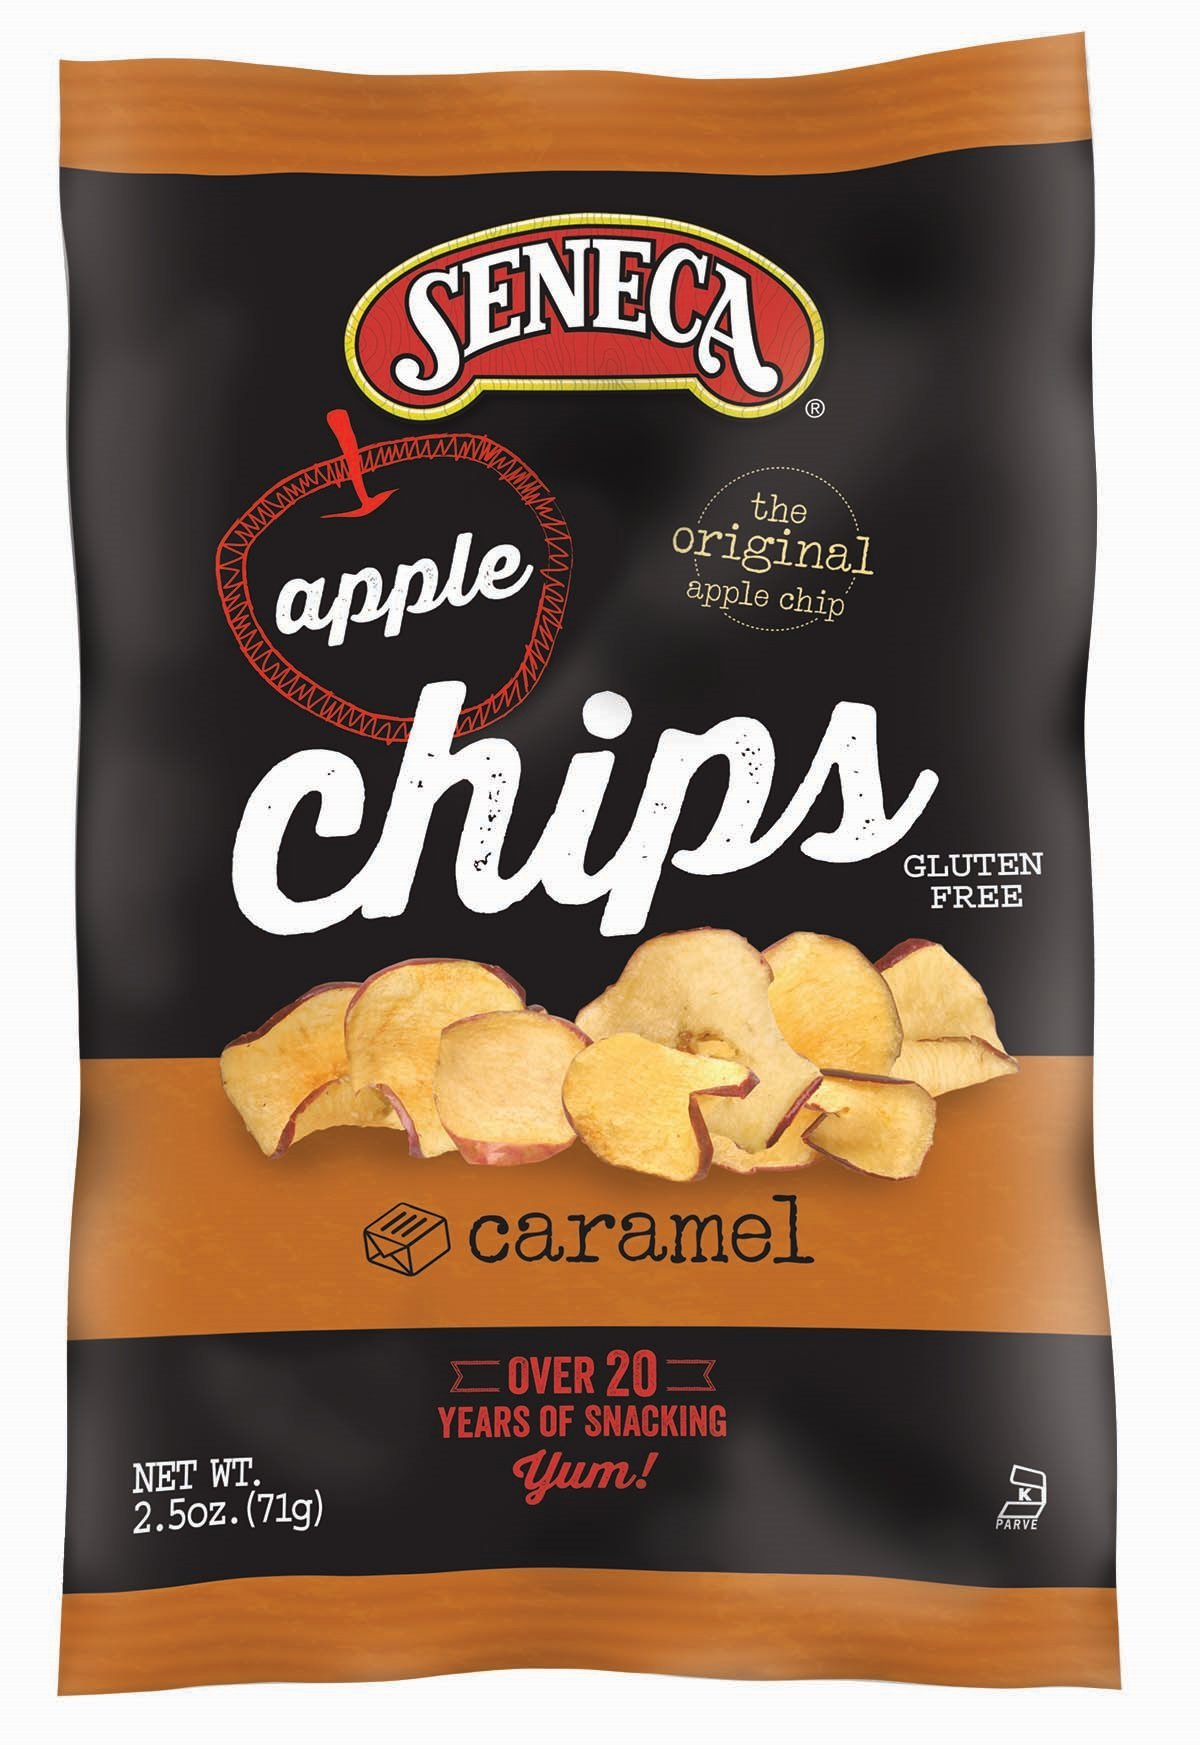 Seneca Caramel Apple Chips,2.5-Ounce Bags (Pack of 12)